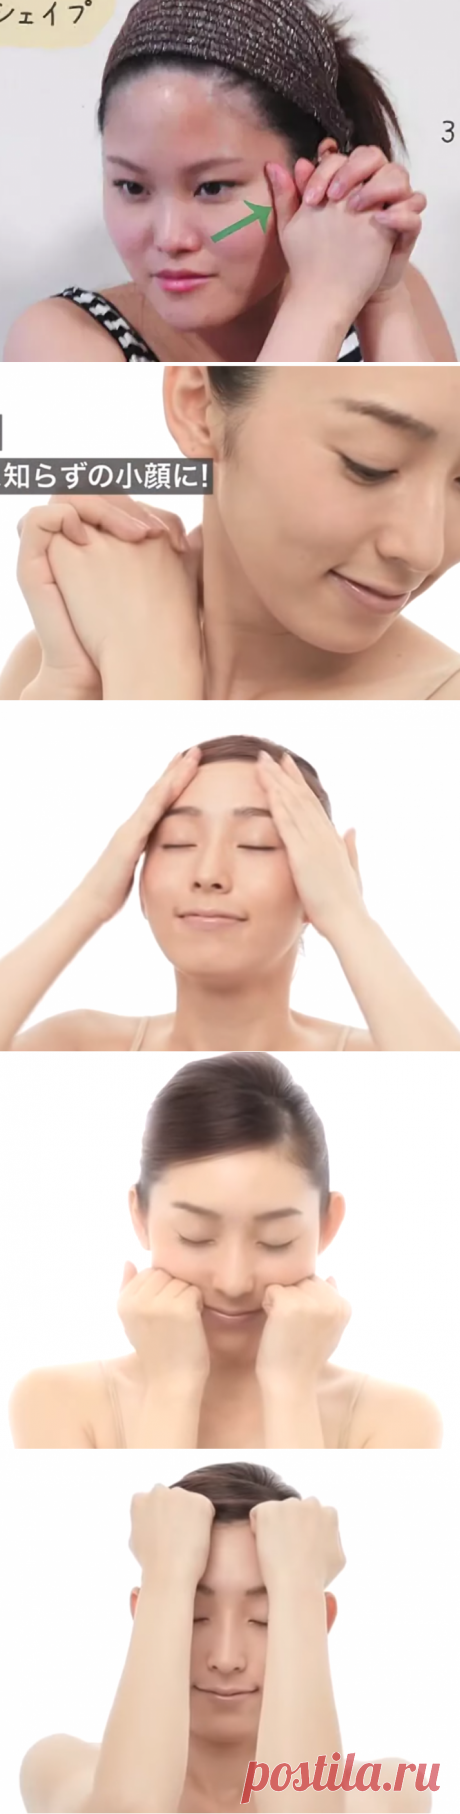 Пластика лица... своими руками? Японский массаж Коруги! | 7 минут на красоту | Яндекс Дзен